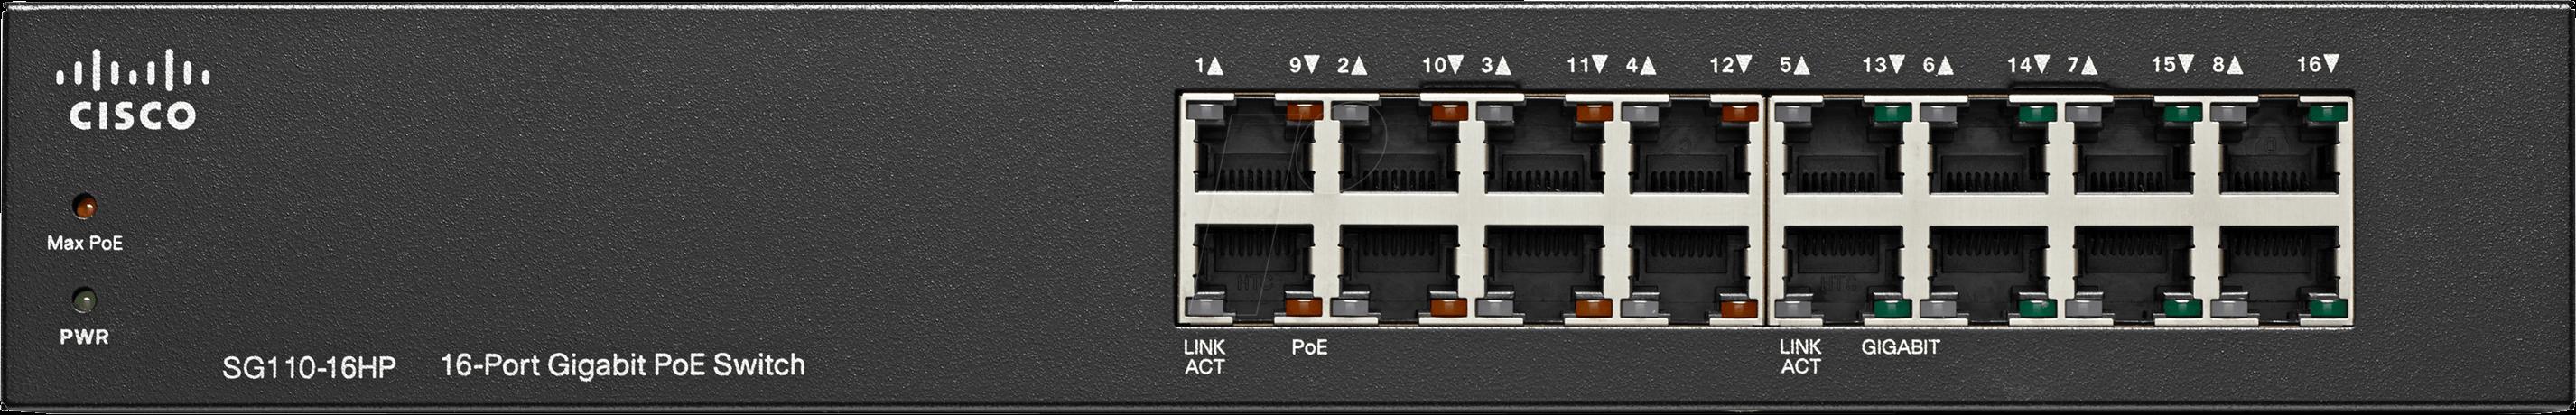 8x10//100//1000 8x10//100//1000- PoE Unmanaged SG110-16HP Switch